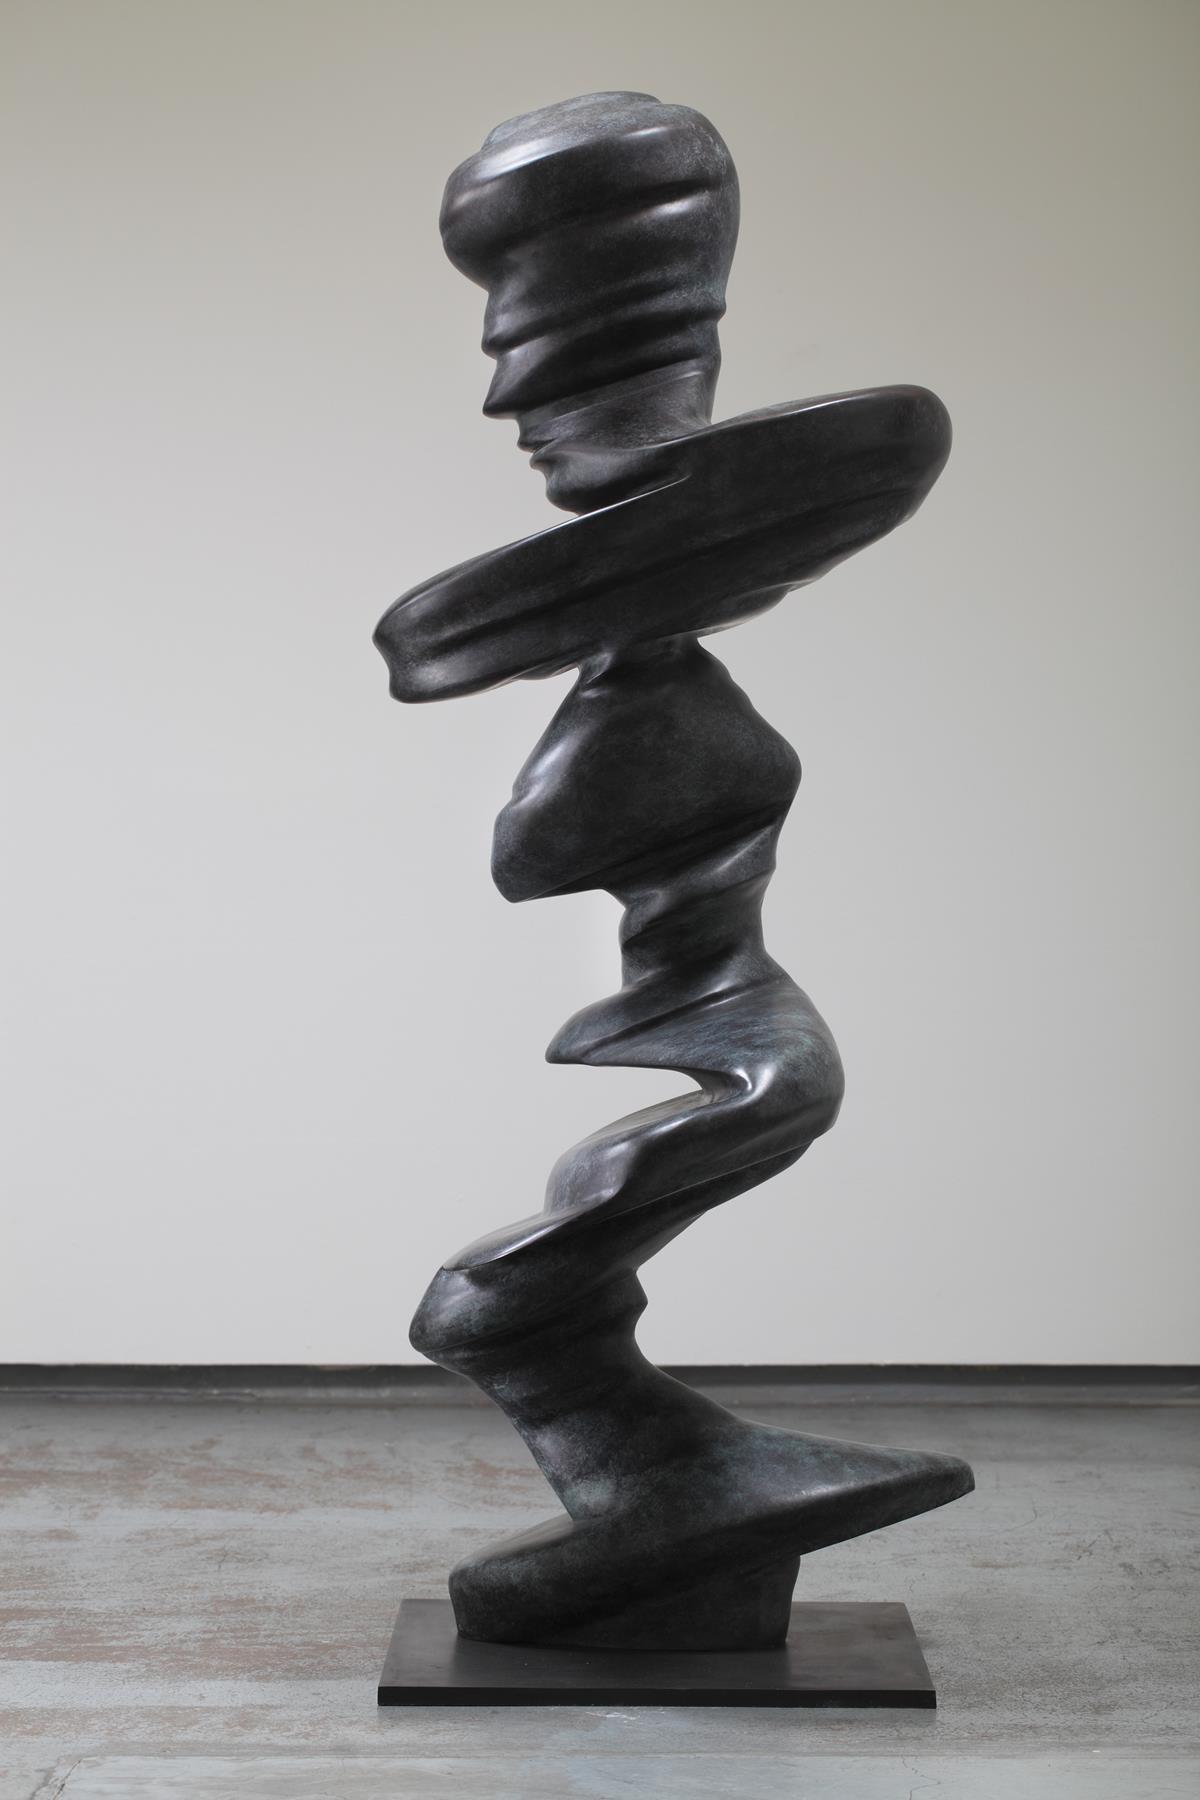 Tony Cragg, Dancer, 2008, dim 186 × 80 × 80, bronze, photo Martin Polak